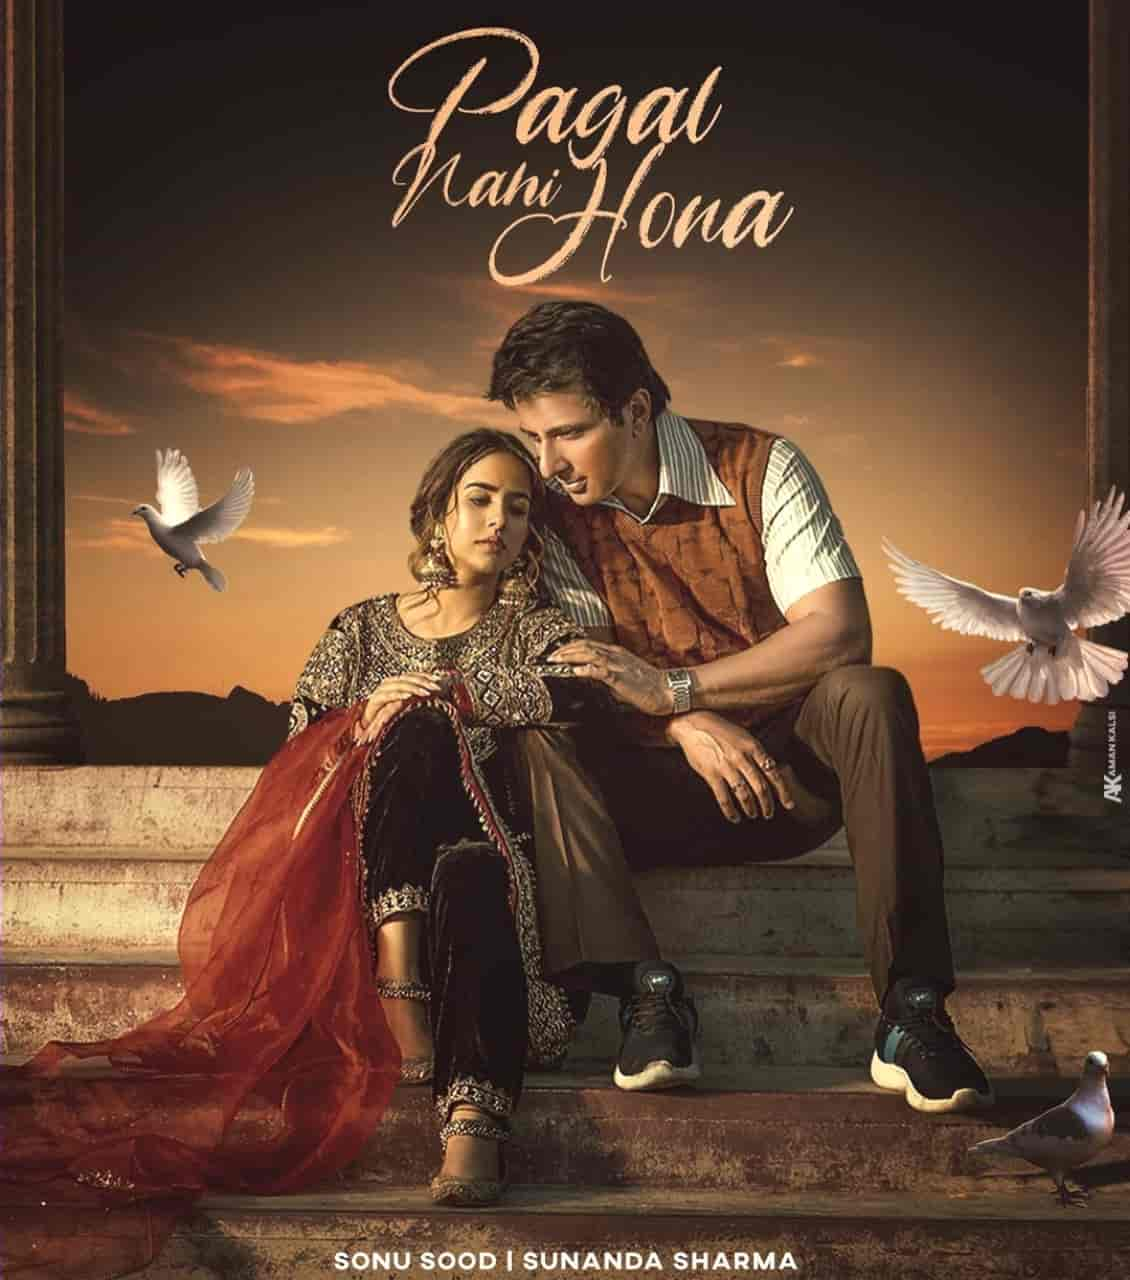 Pagal Nahi Hona Punjabi Song Image Features Sunanda Sharma And Sonu Sood